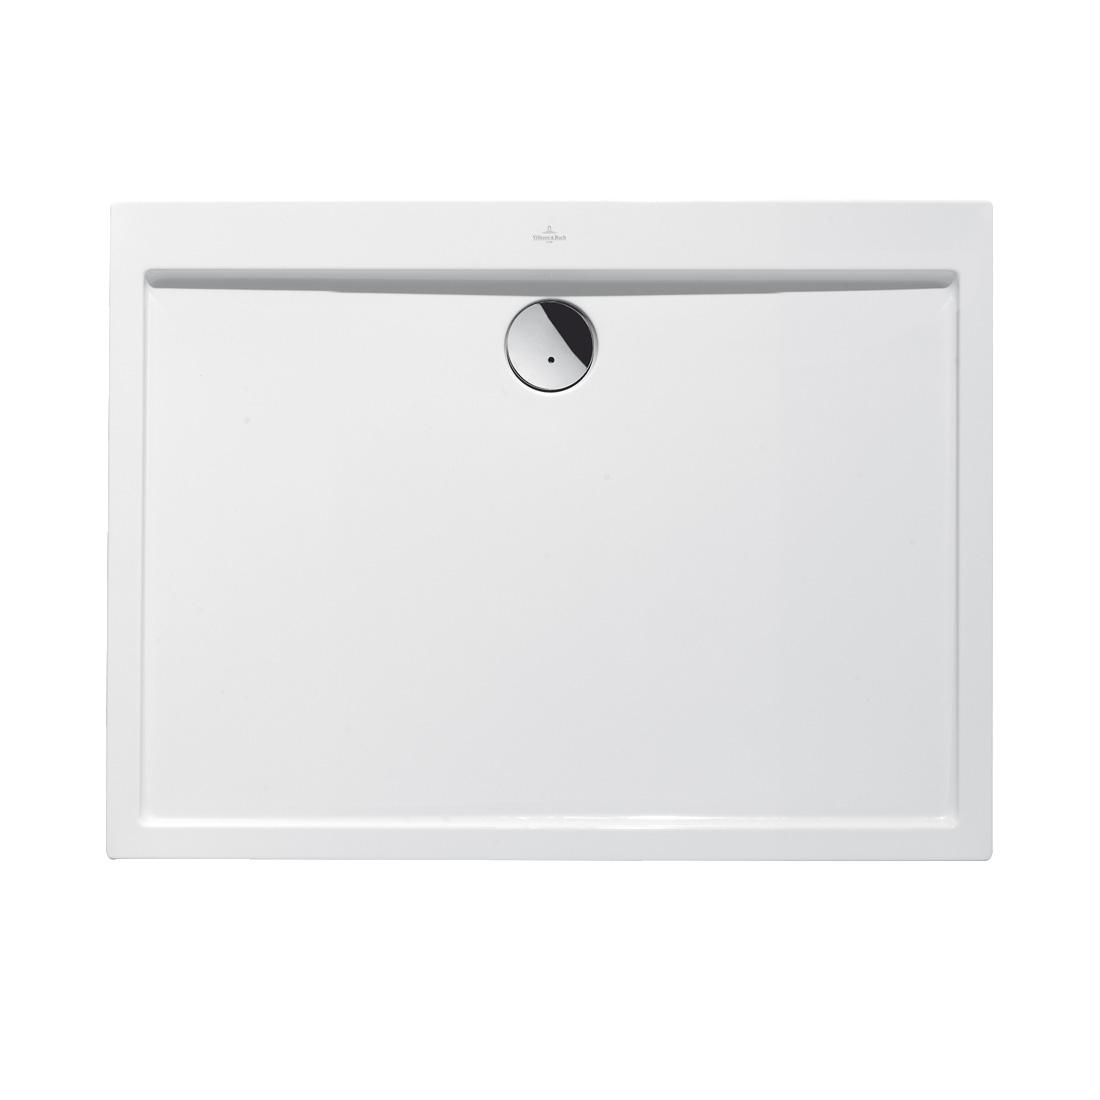 villeroy boch subway rechteck duschwanne star white. Black Bedroom Furniture Sets. Home Design Ideas